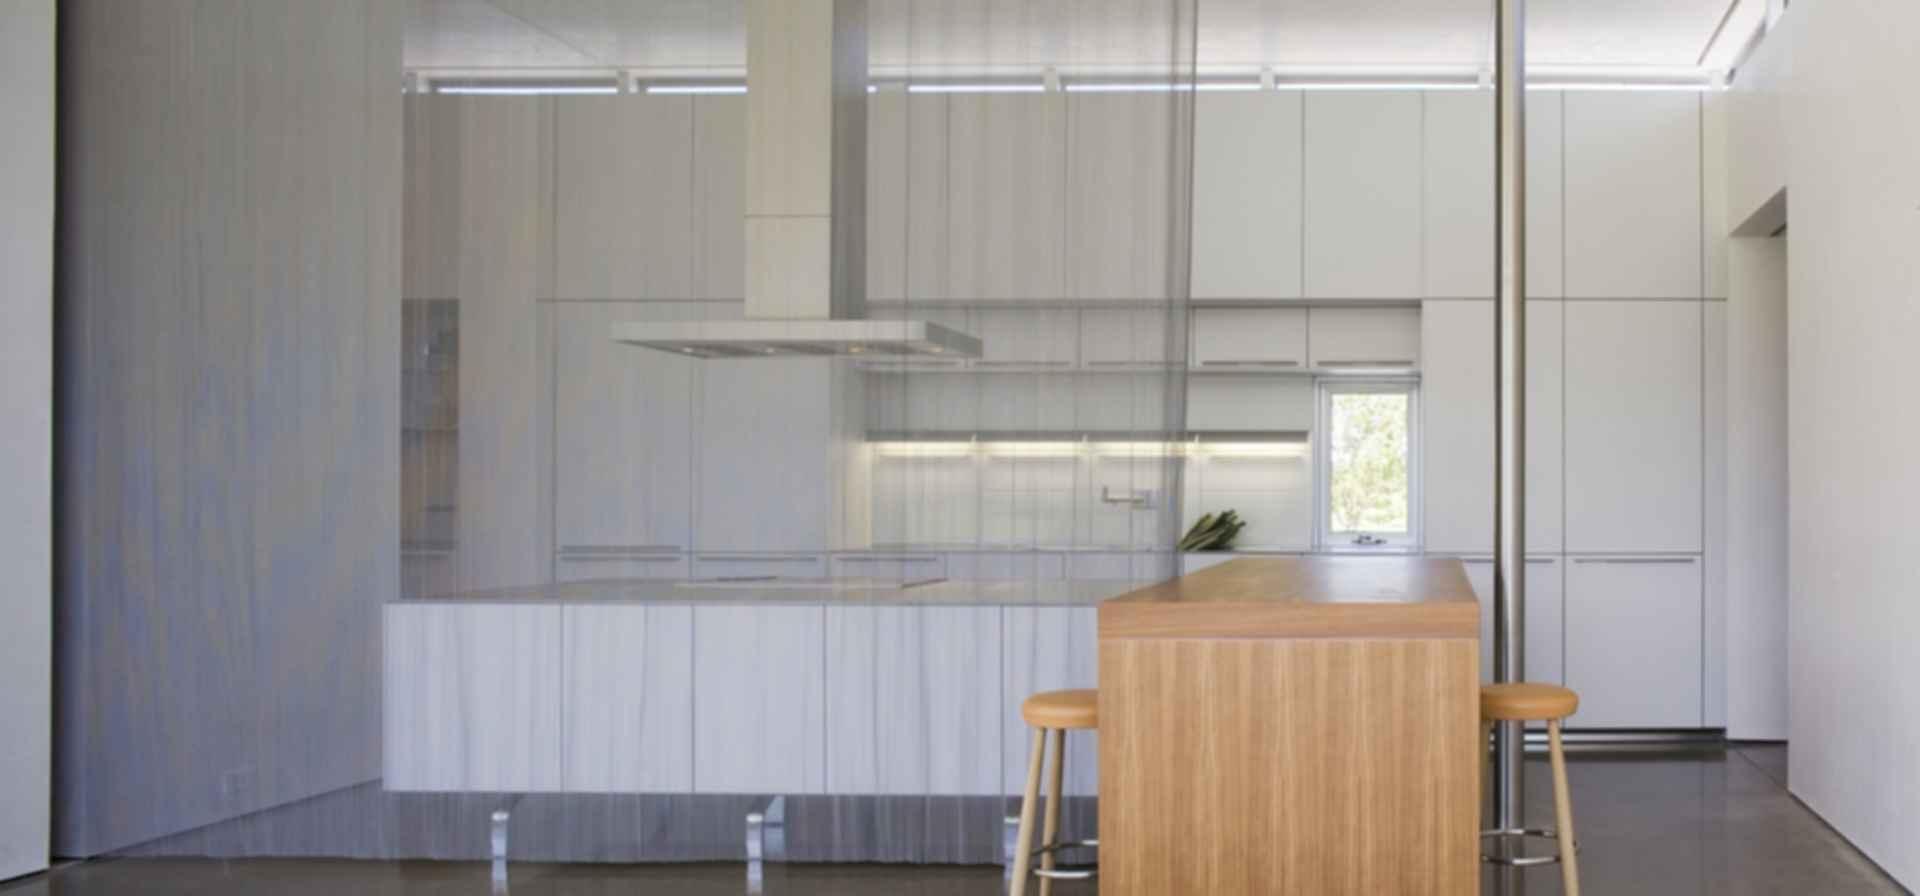 East Aurora Residence - Kitchen